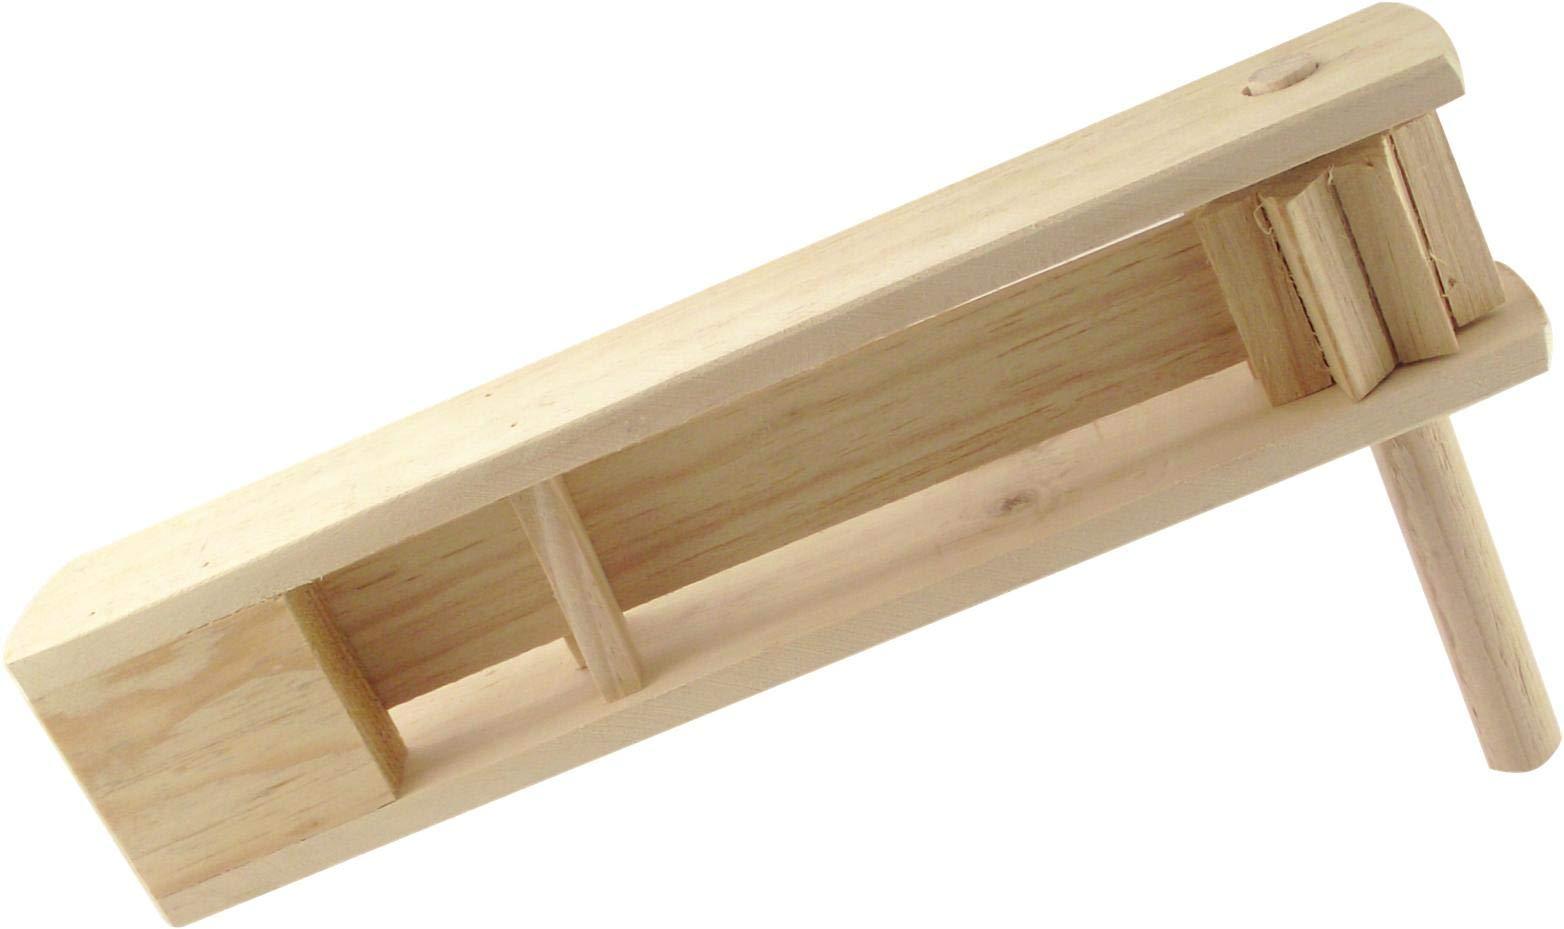 Big Wooden Matraca Noisemaker - 15'' long Ratchet